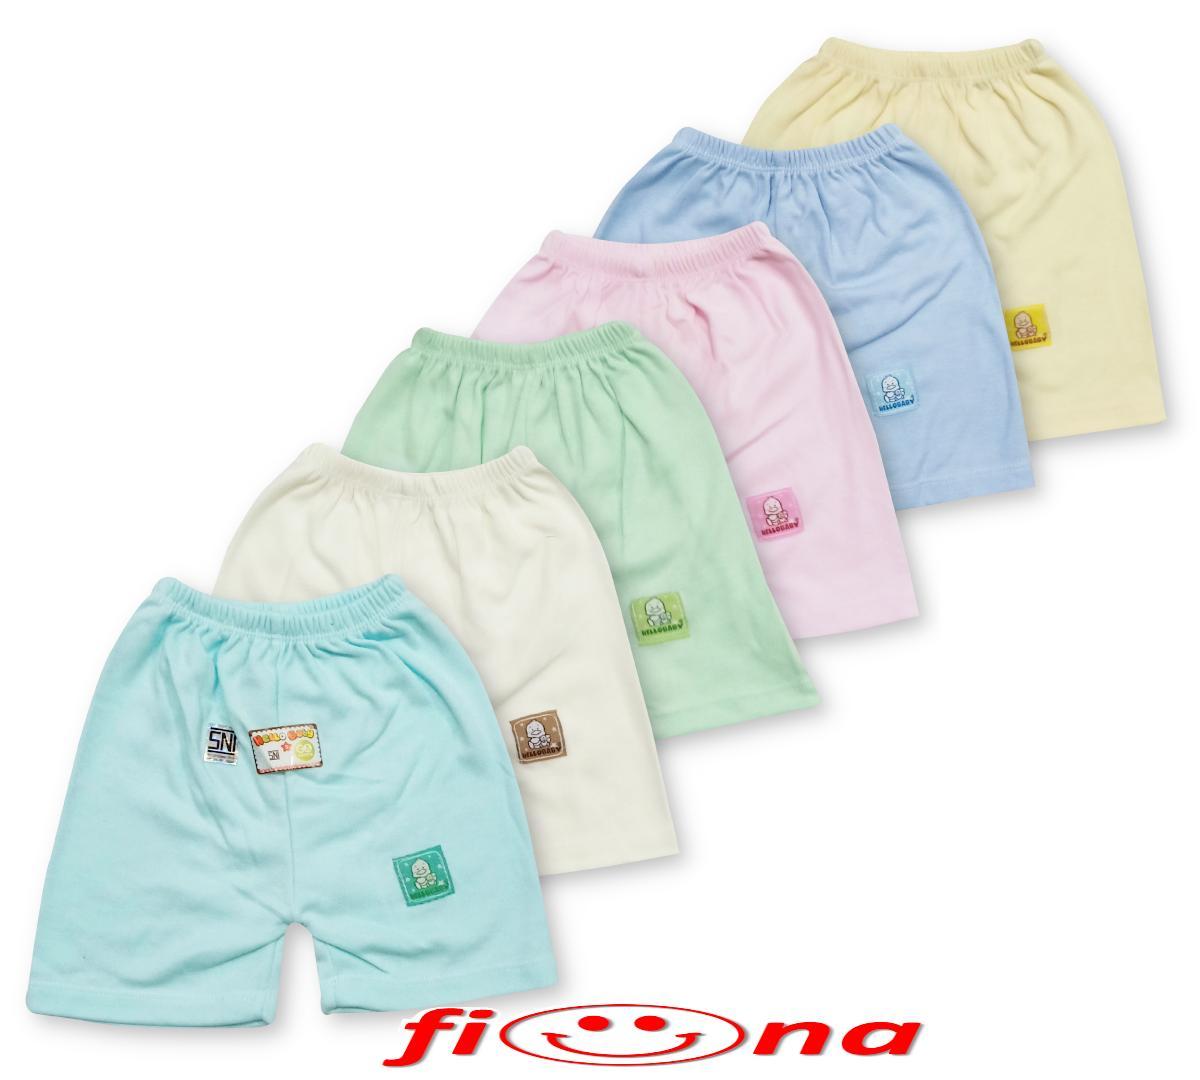 Fiona 6 Pcs Celana Pendek Anak Bayi Warna Polos Model Kotak Hello Baby Laki Laki Dan Perempuan By Fiona Baby Shop.